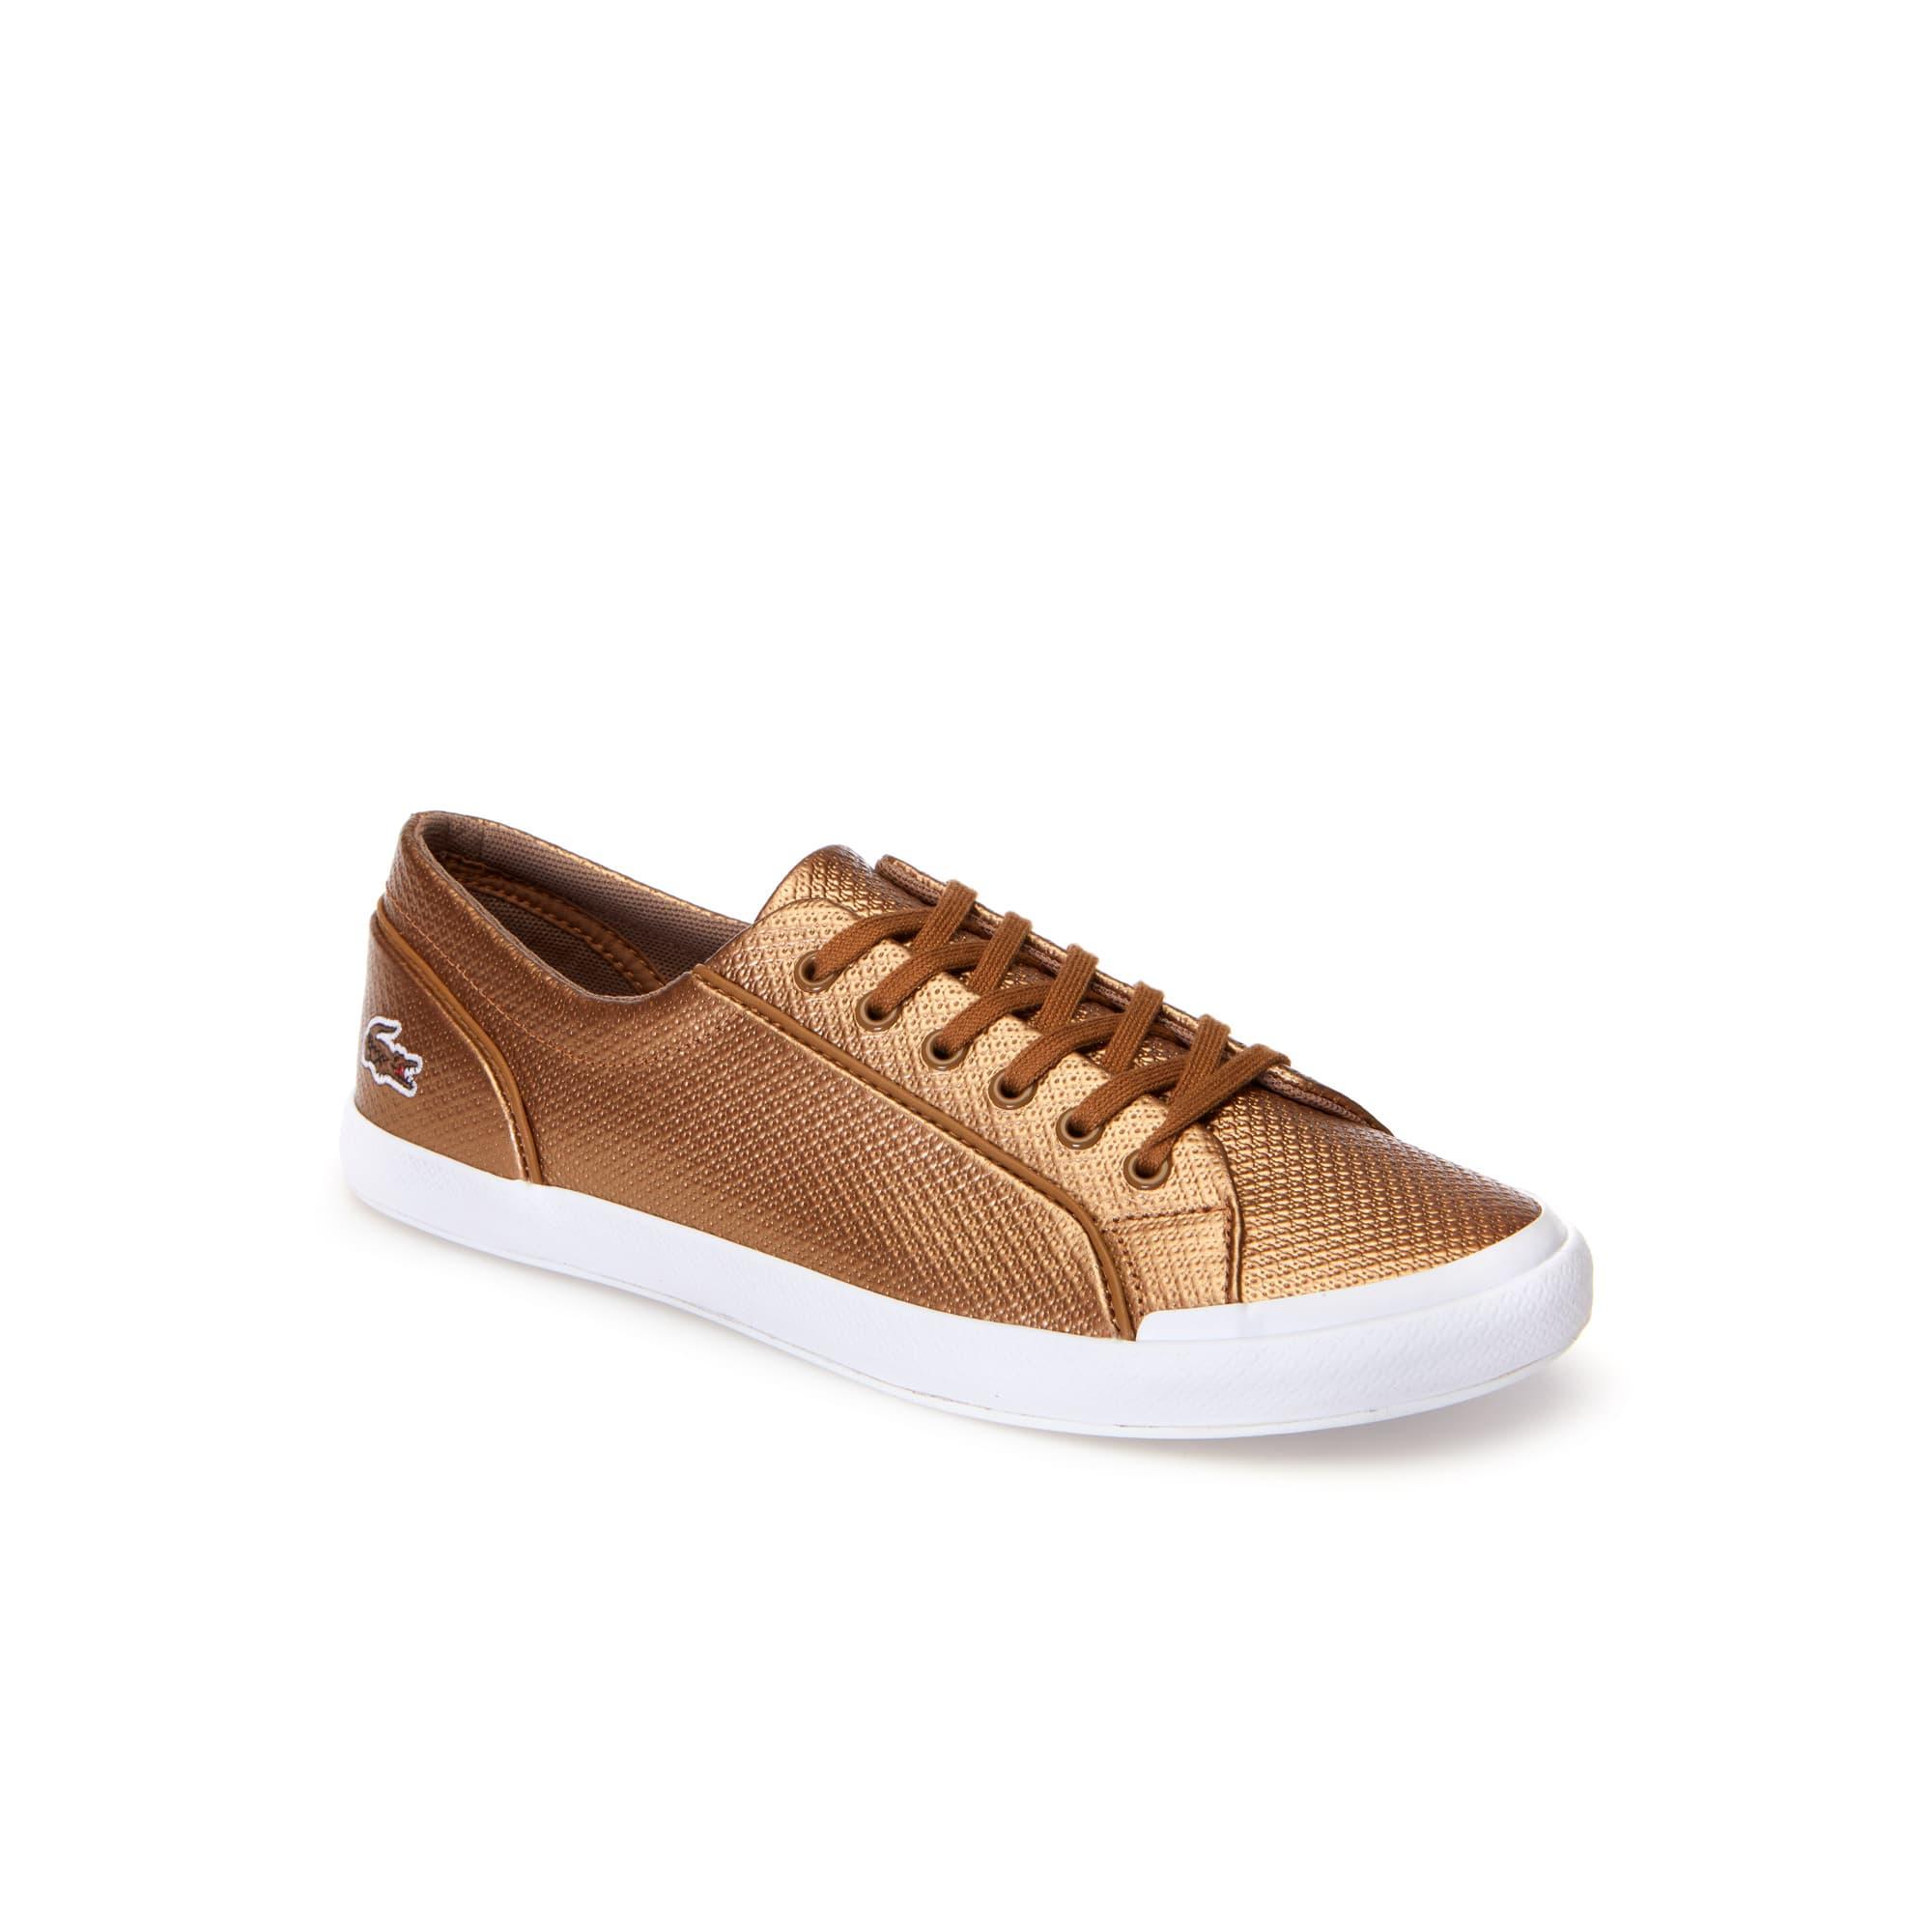 98cbe984aa Sneakers Lancelle Bronze femme Chantaco en cuir